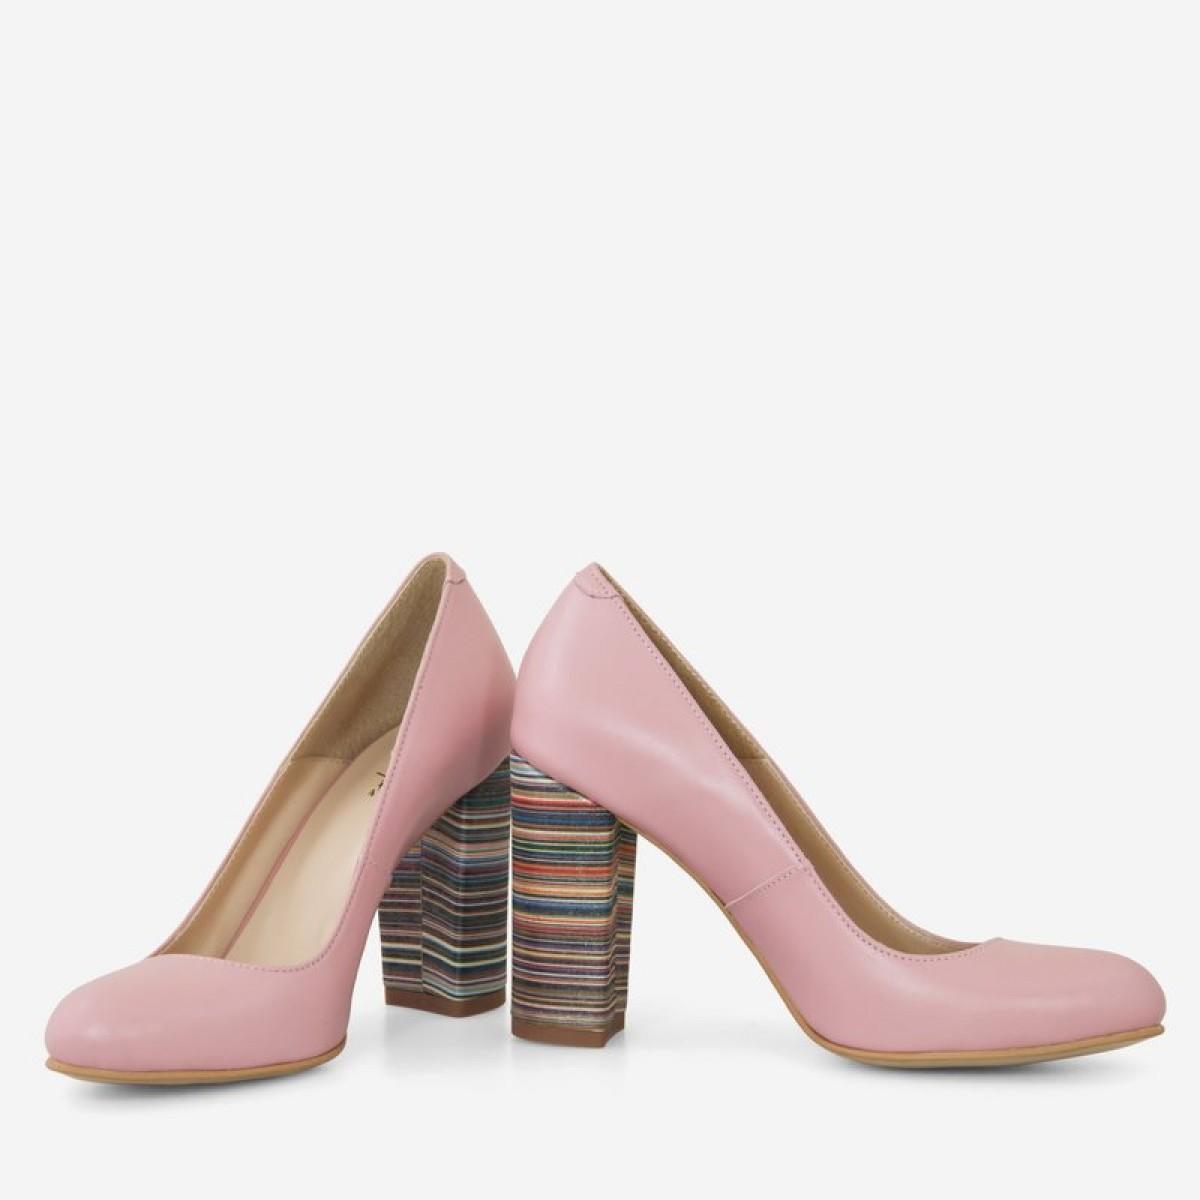 Pantofi Dama Piele Roz Prafuit Fabiola